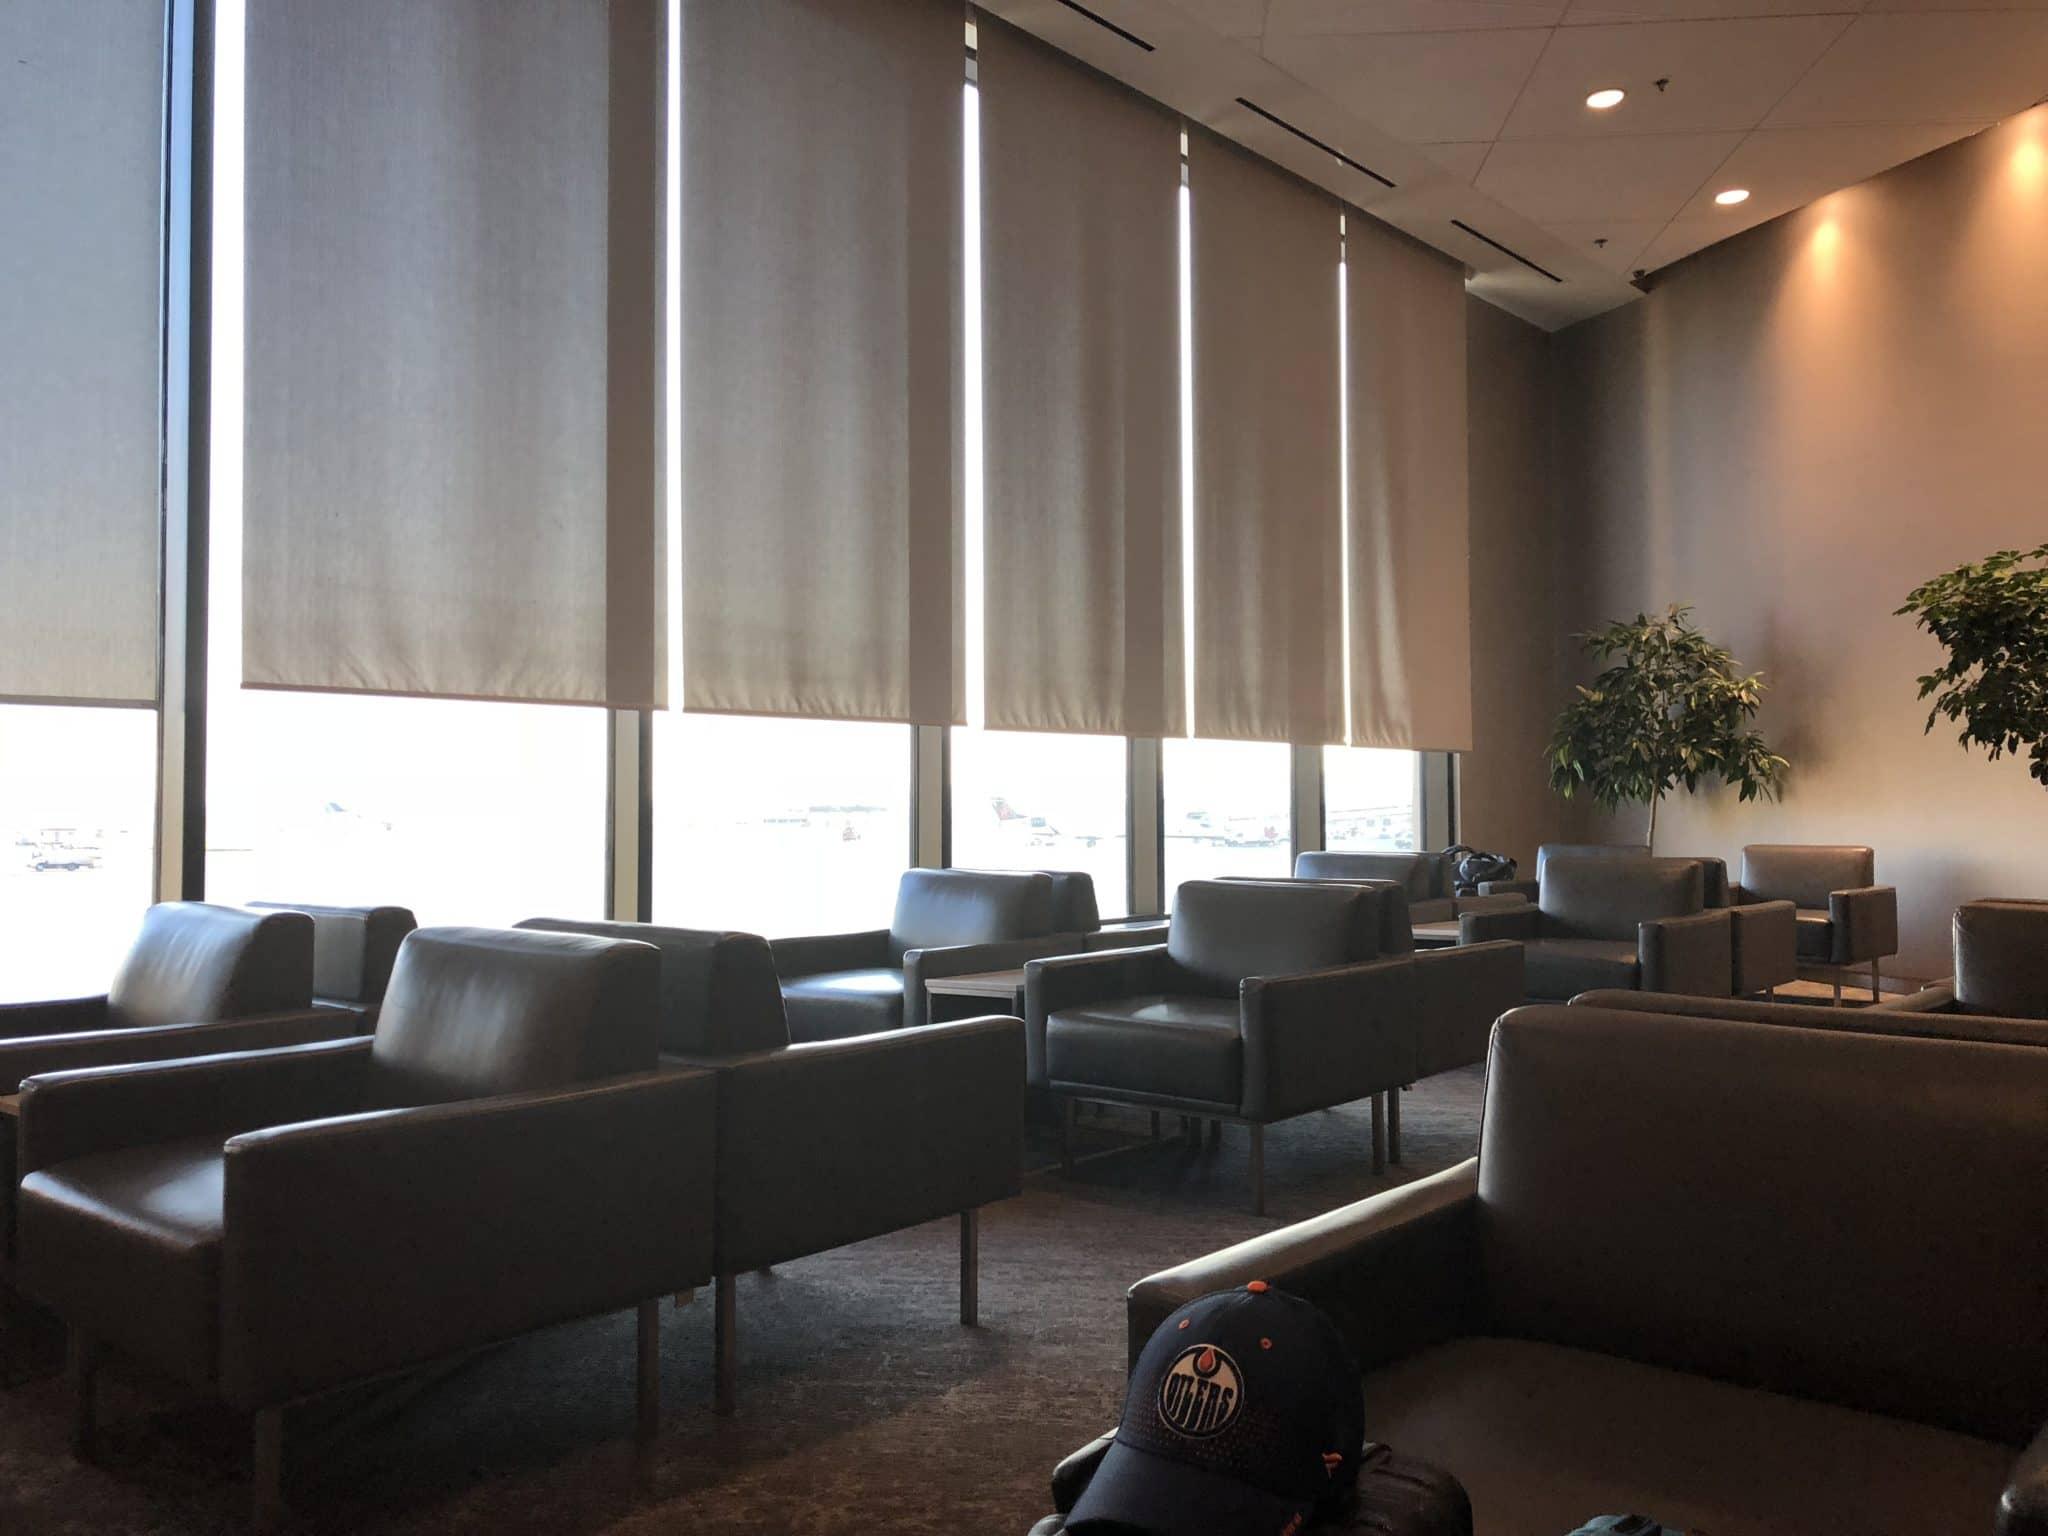 Air Canada Maple Leaf Lounge Calgary Sitzbereich Fensterfront